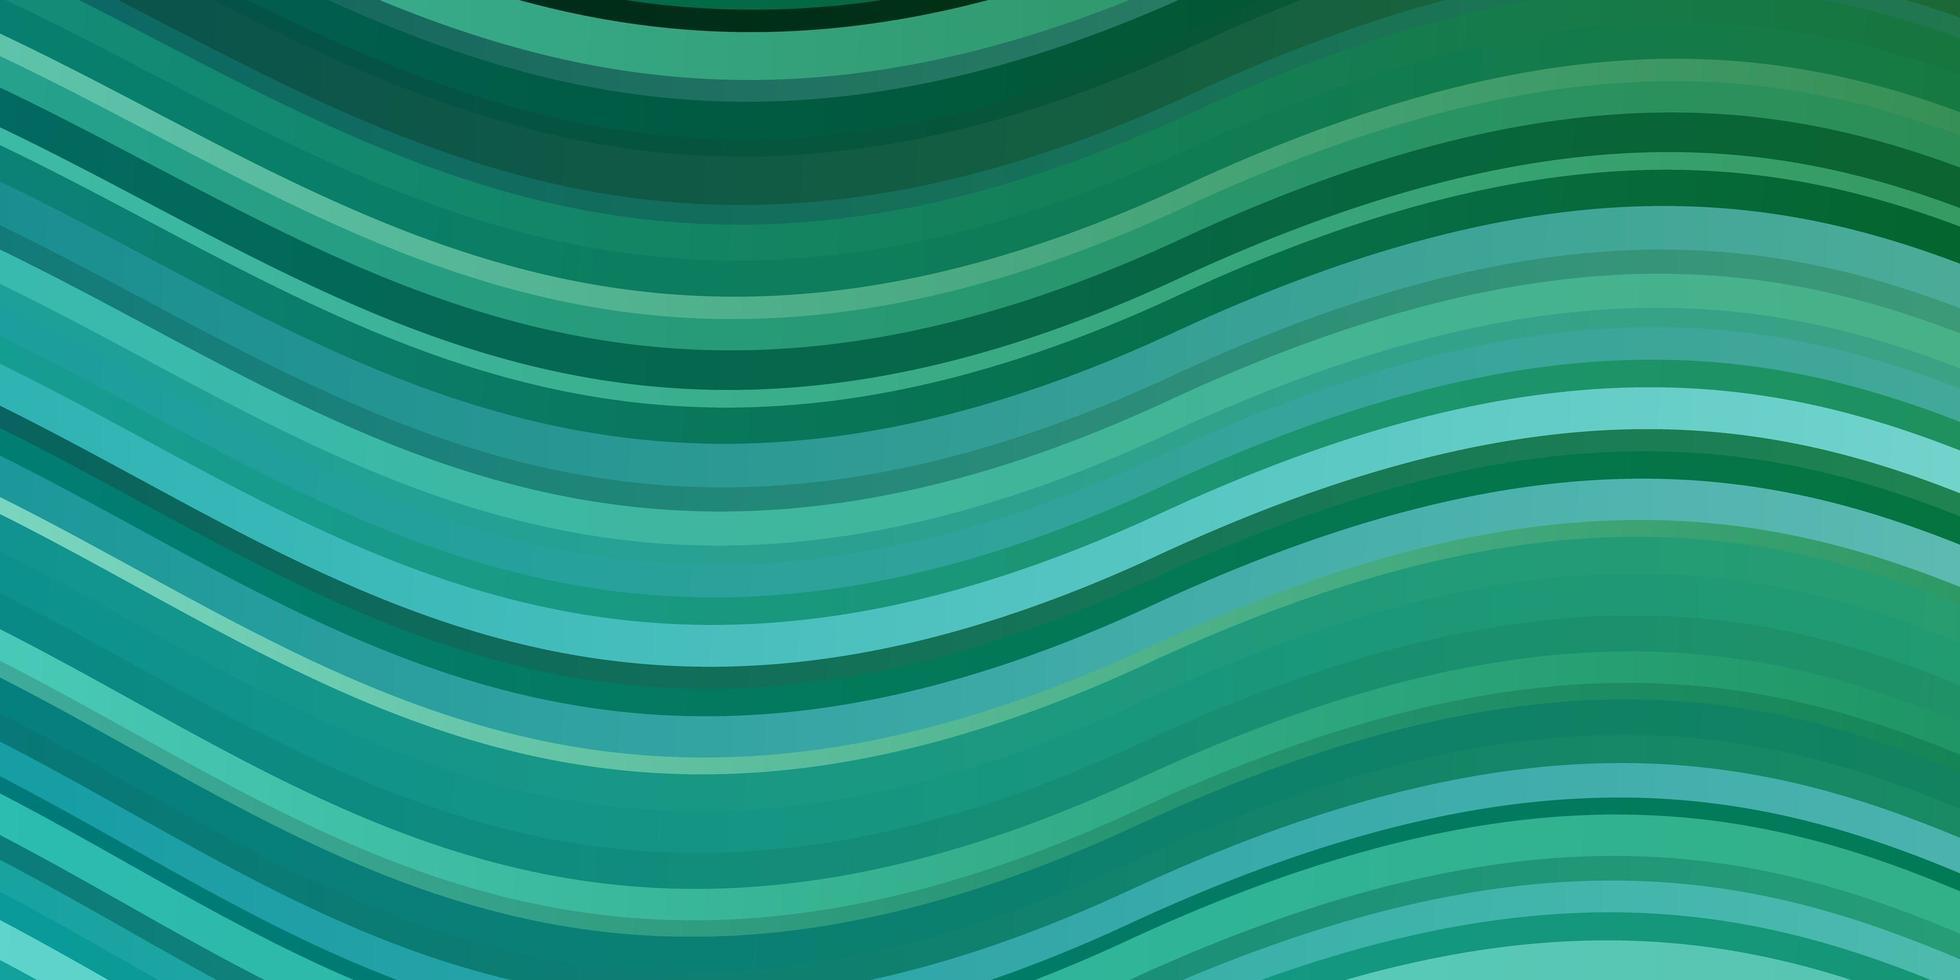 plantilla de vector azul claro, verde con líneas torcidas.